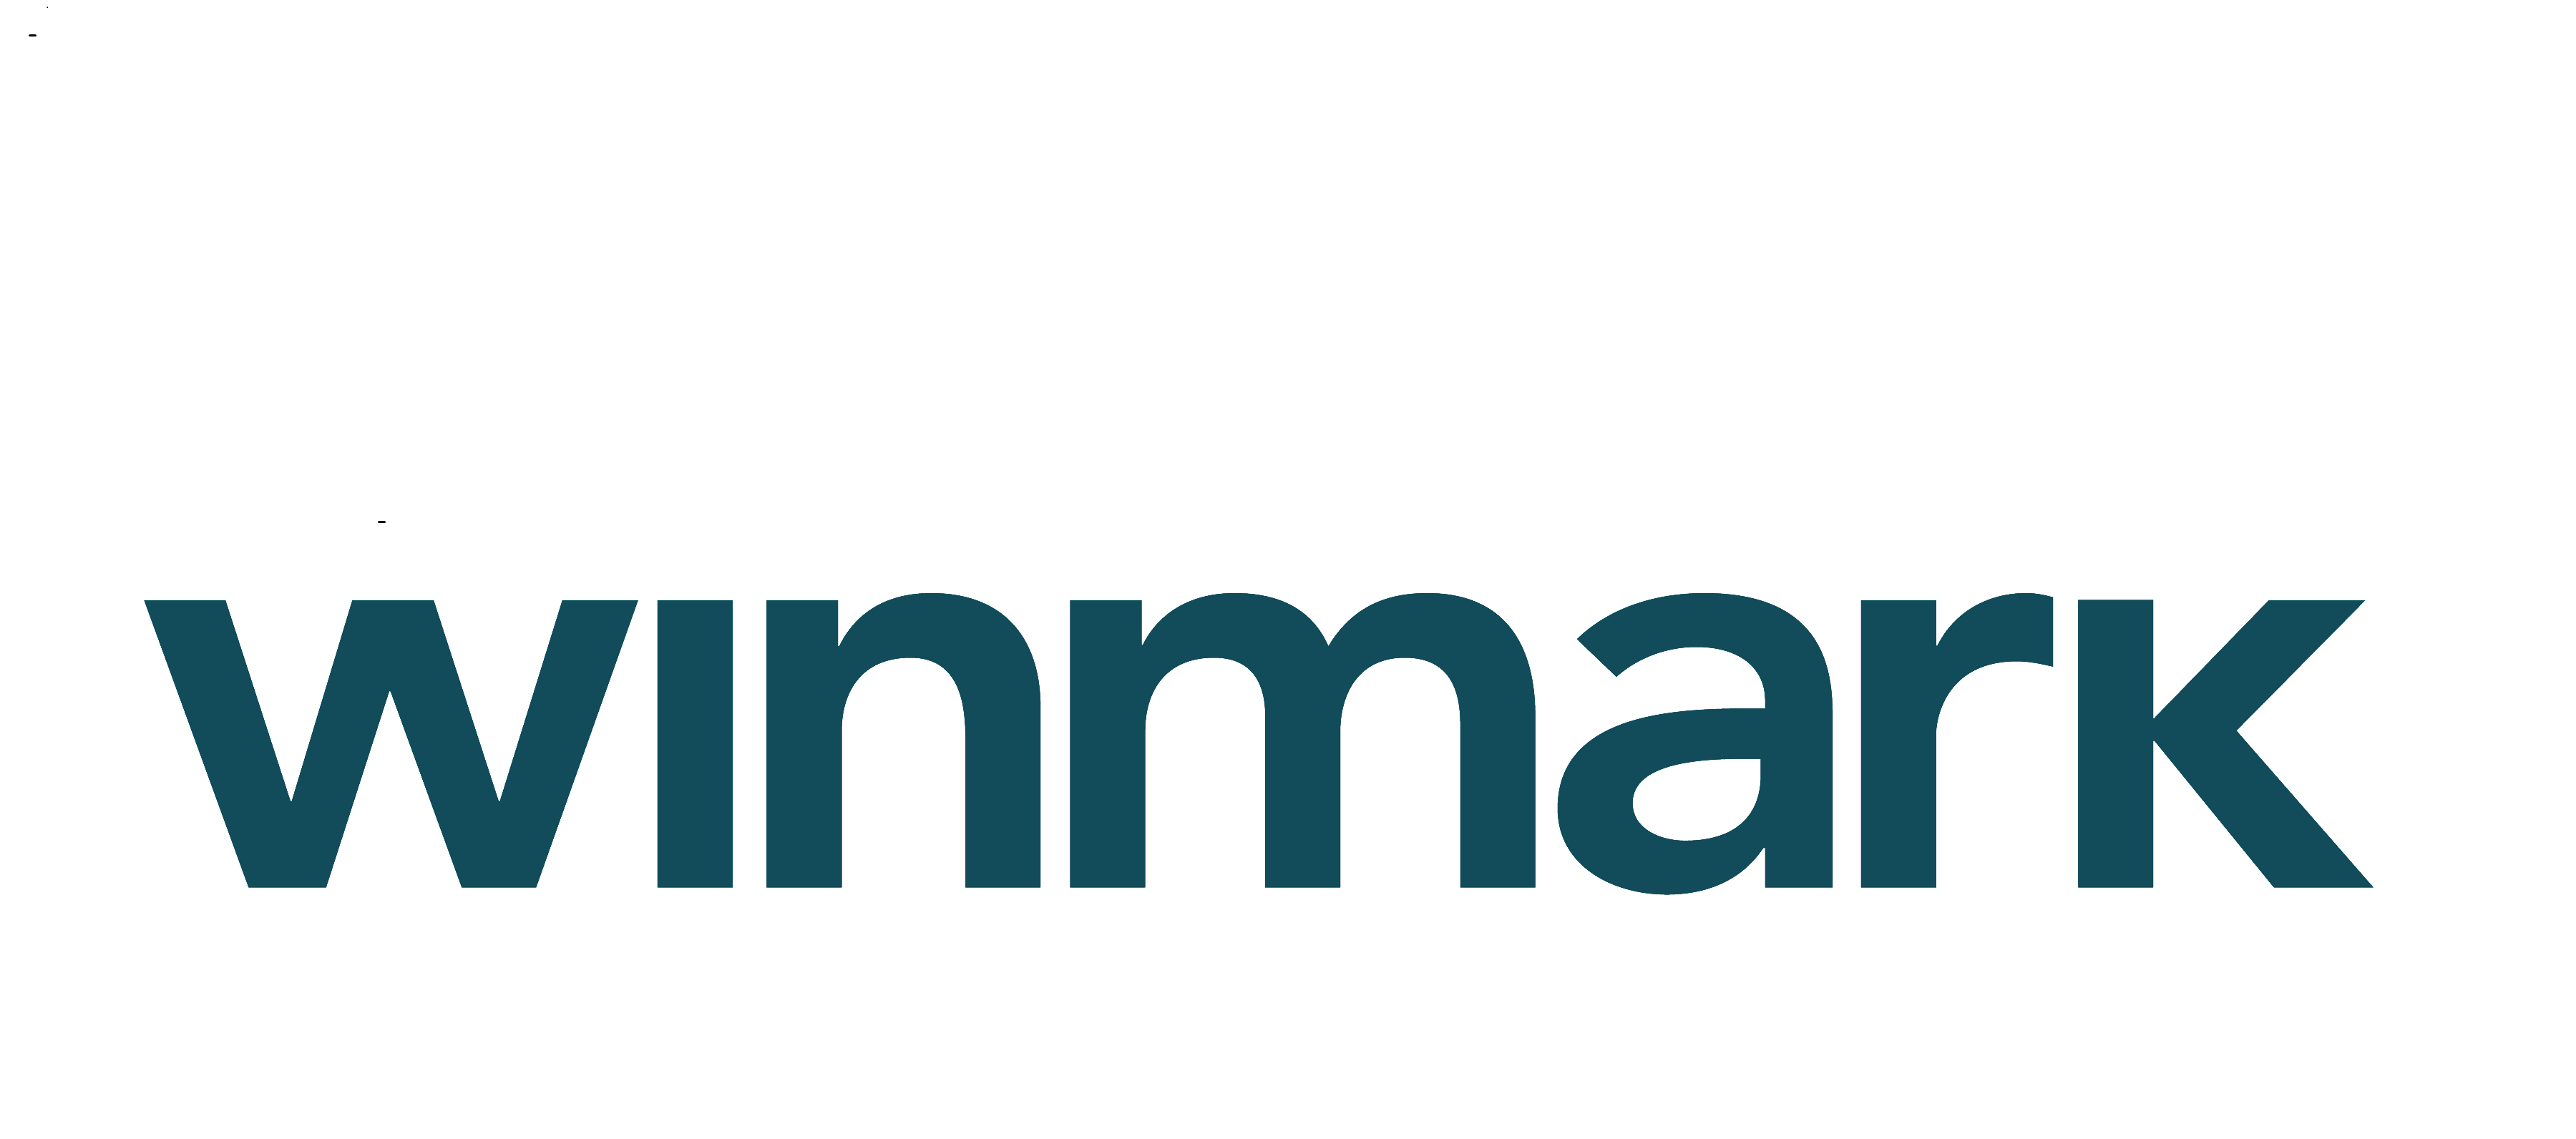 Winmark logo no background2